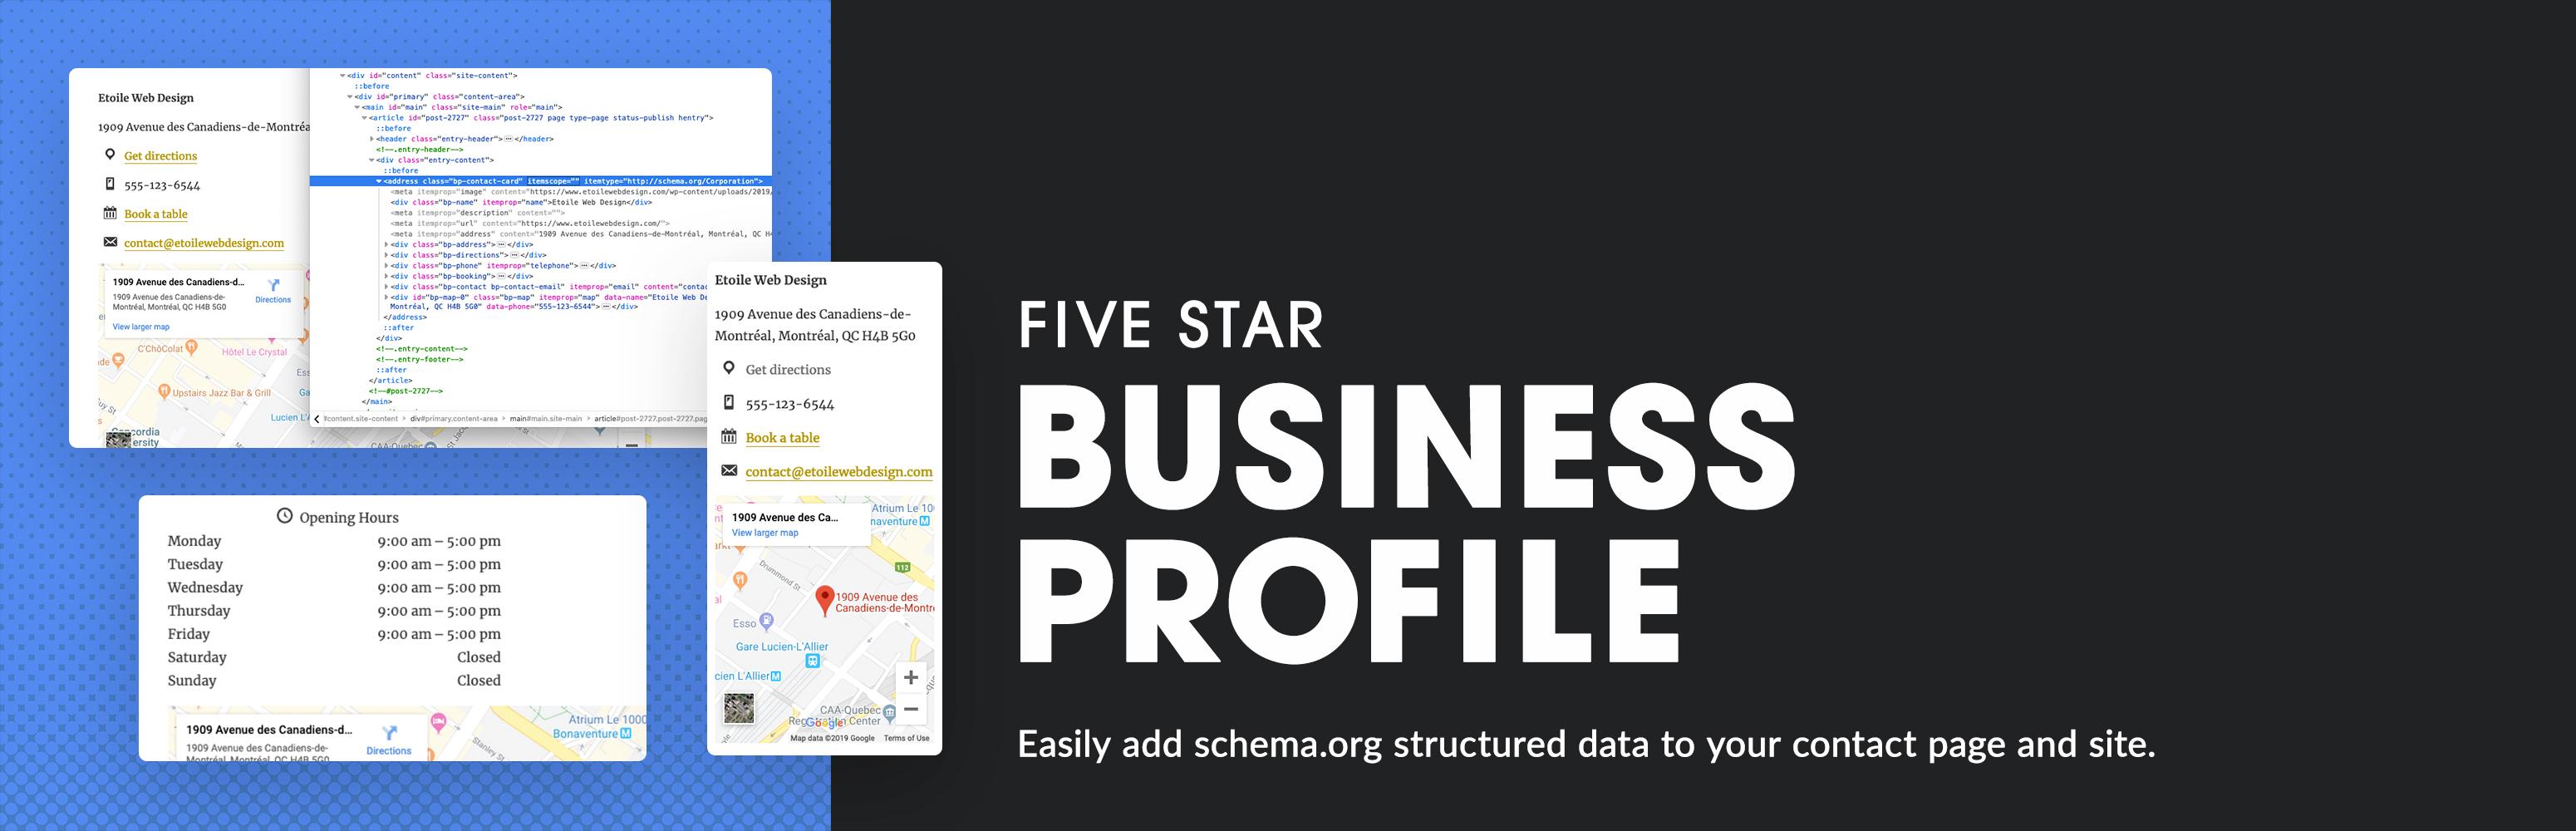 Five Star Business Profile and Schema